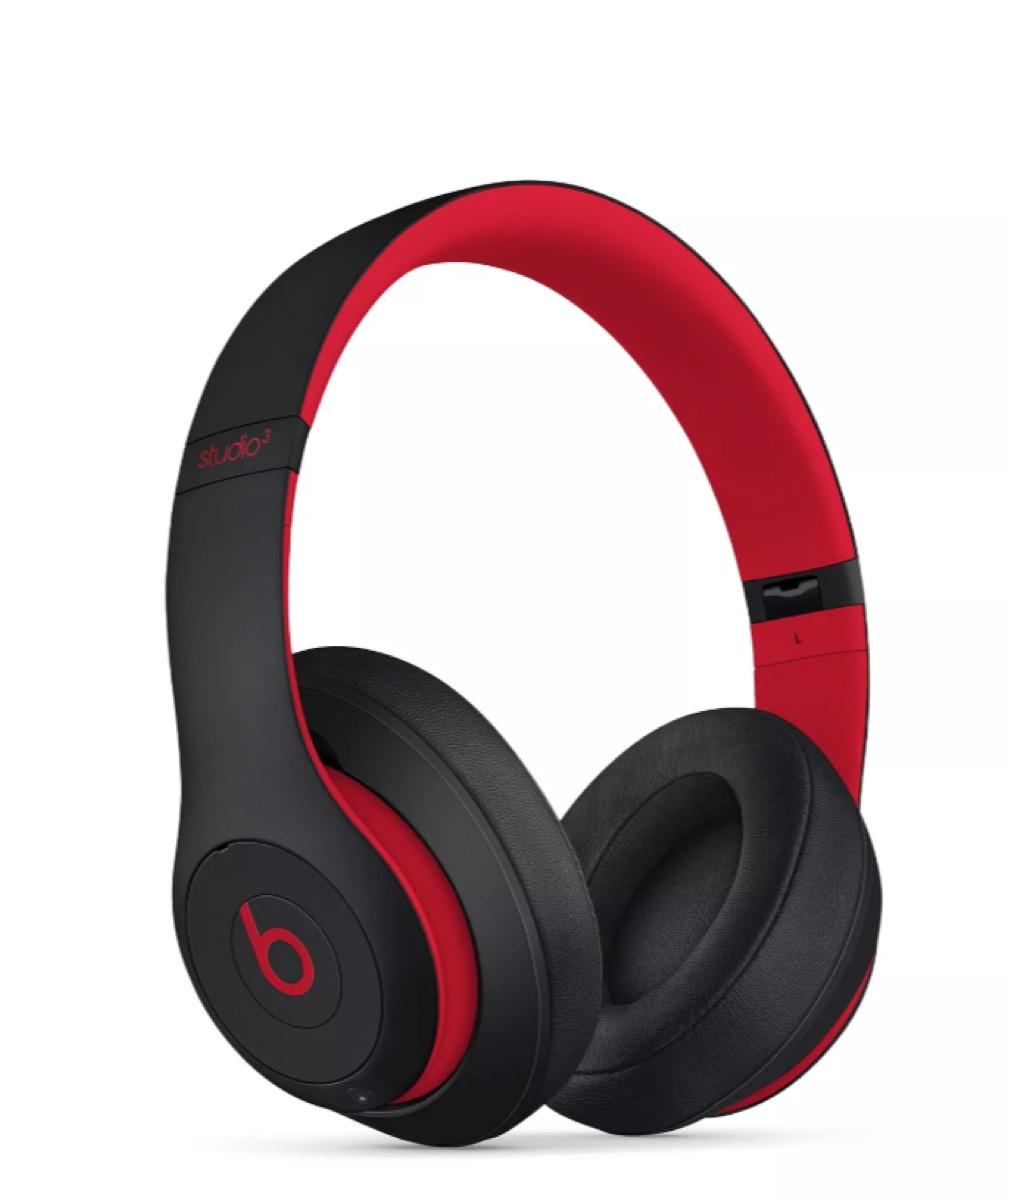 studio 3 wireless headphones beats by dr dre, gifts for girlfriend